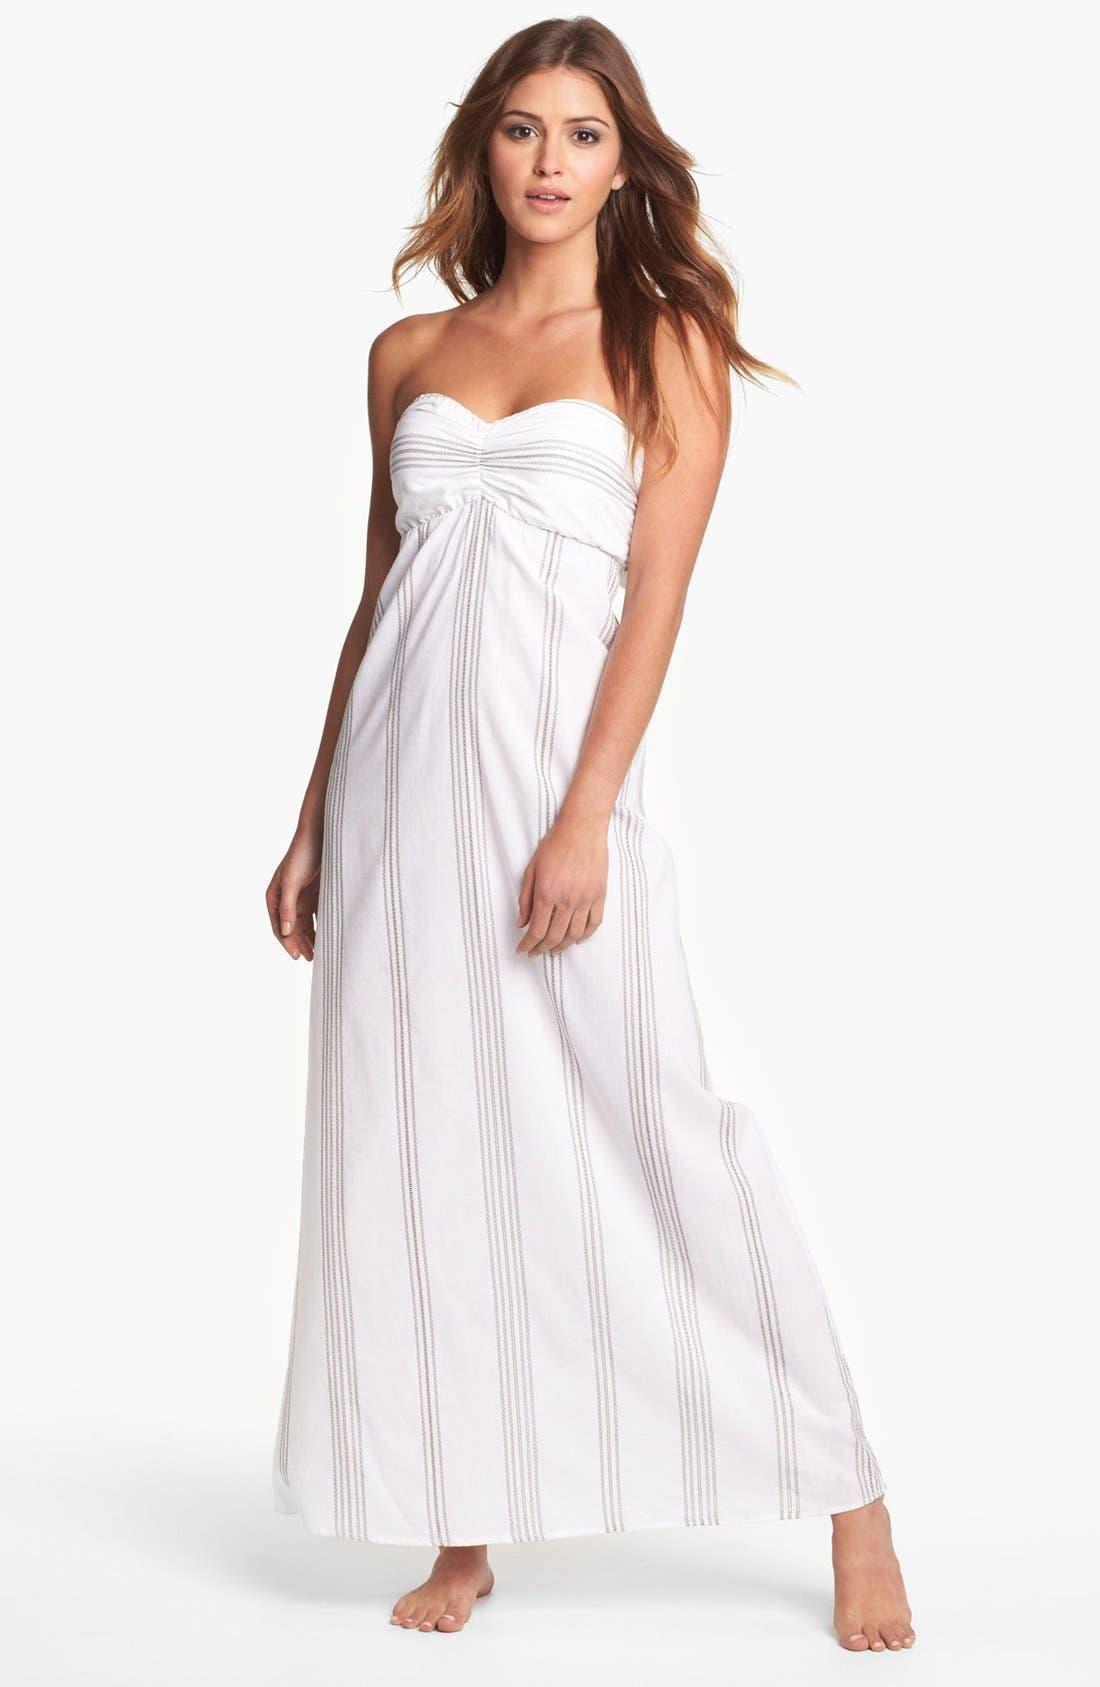 Alternate Image 1 Selected - Tommy Bahama 'Marina Stripe' Bandeau Cover-Up Dress